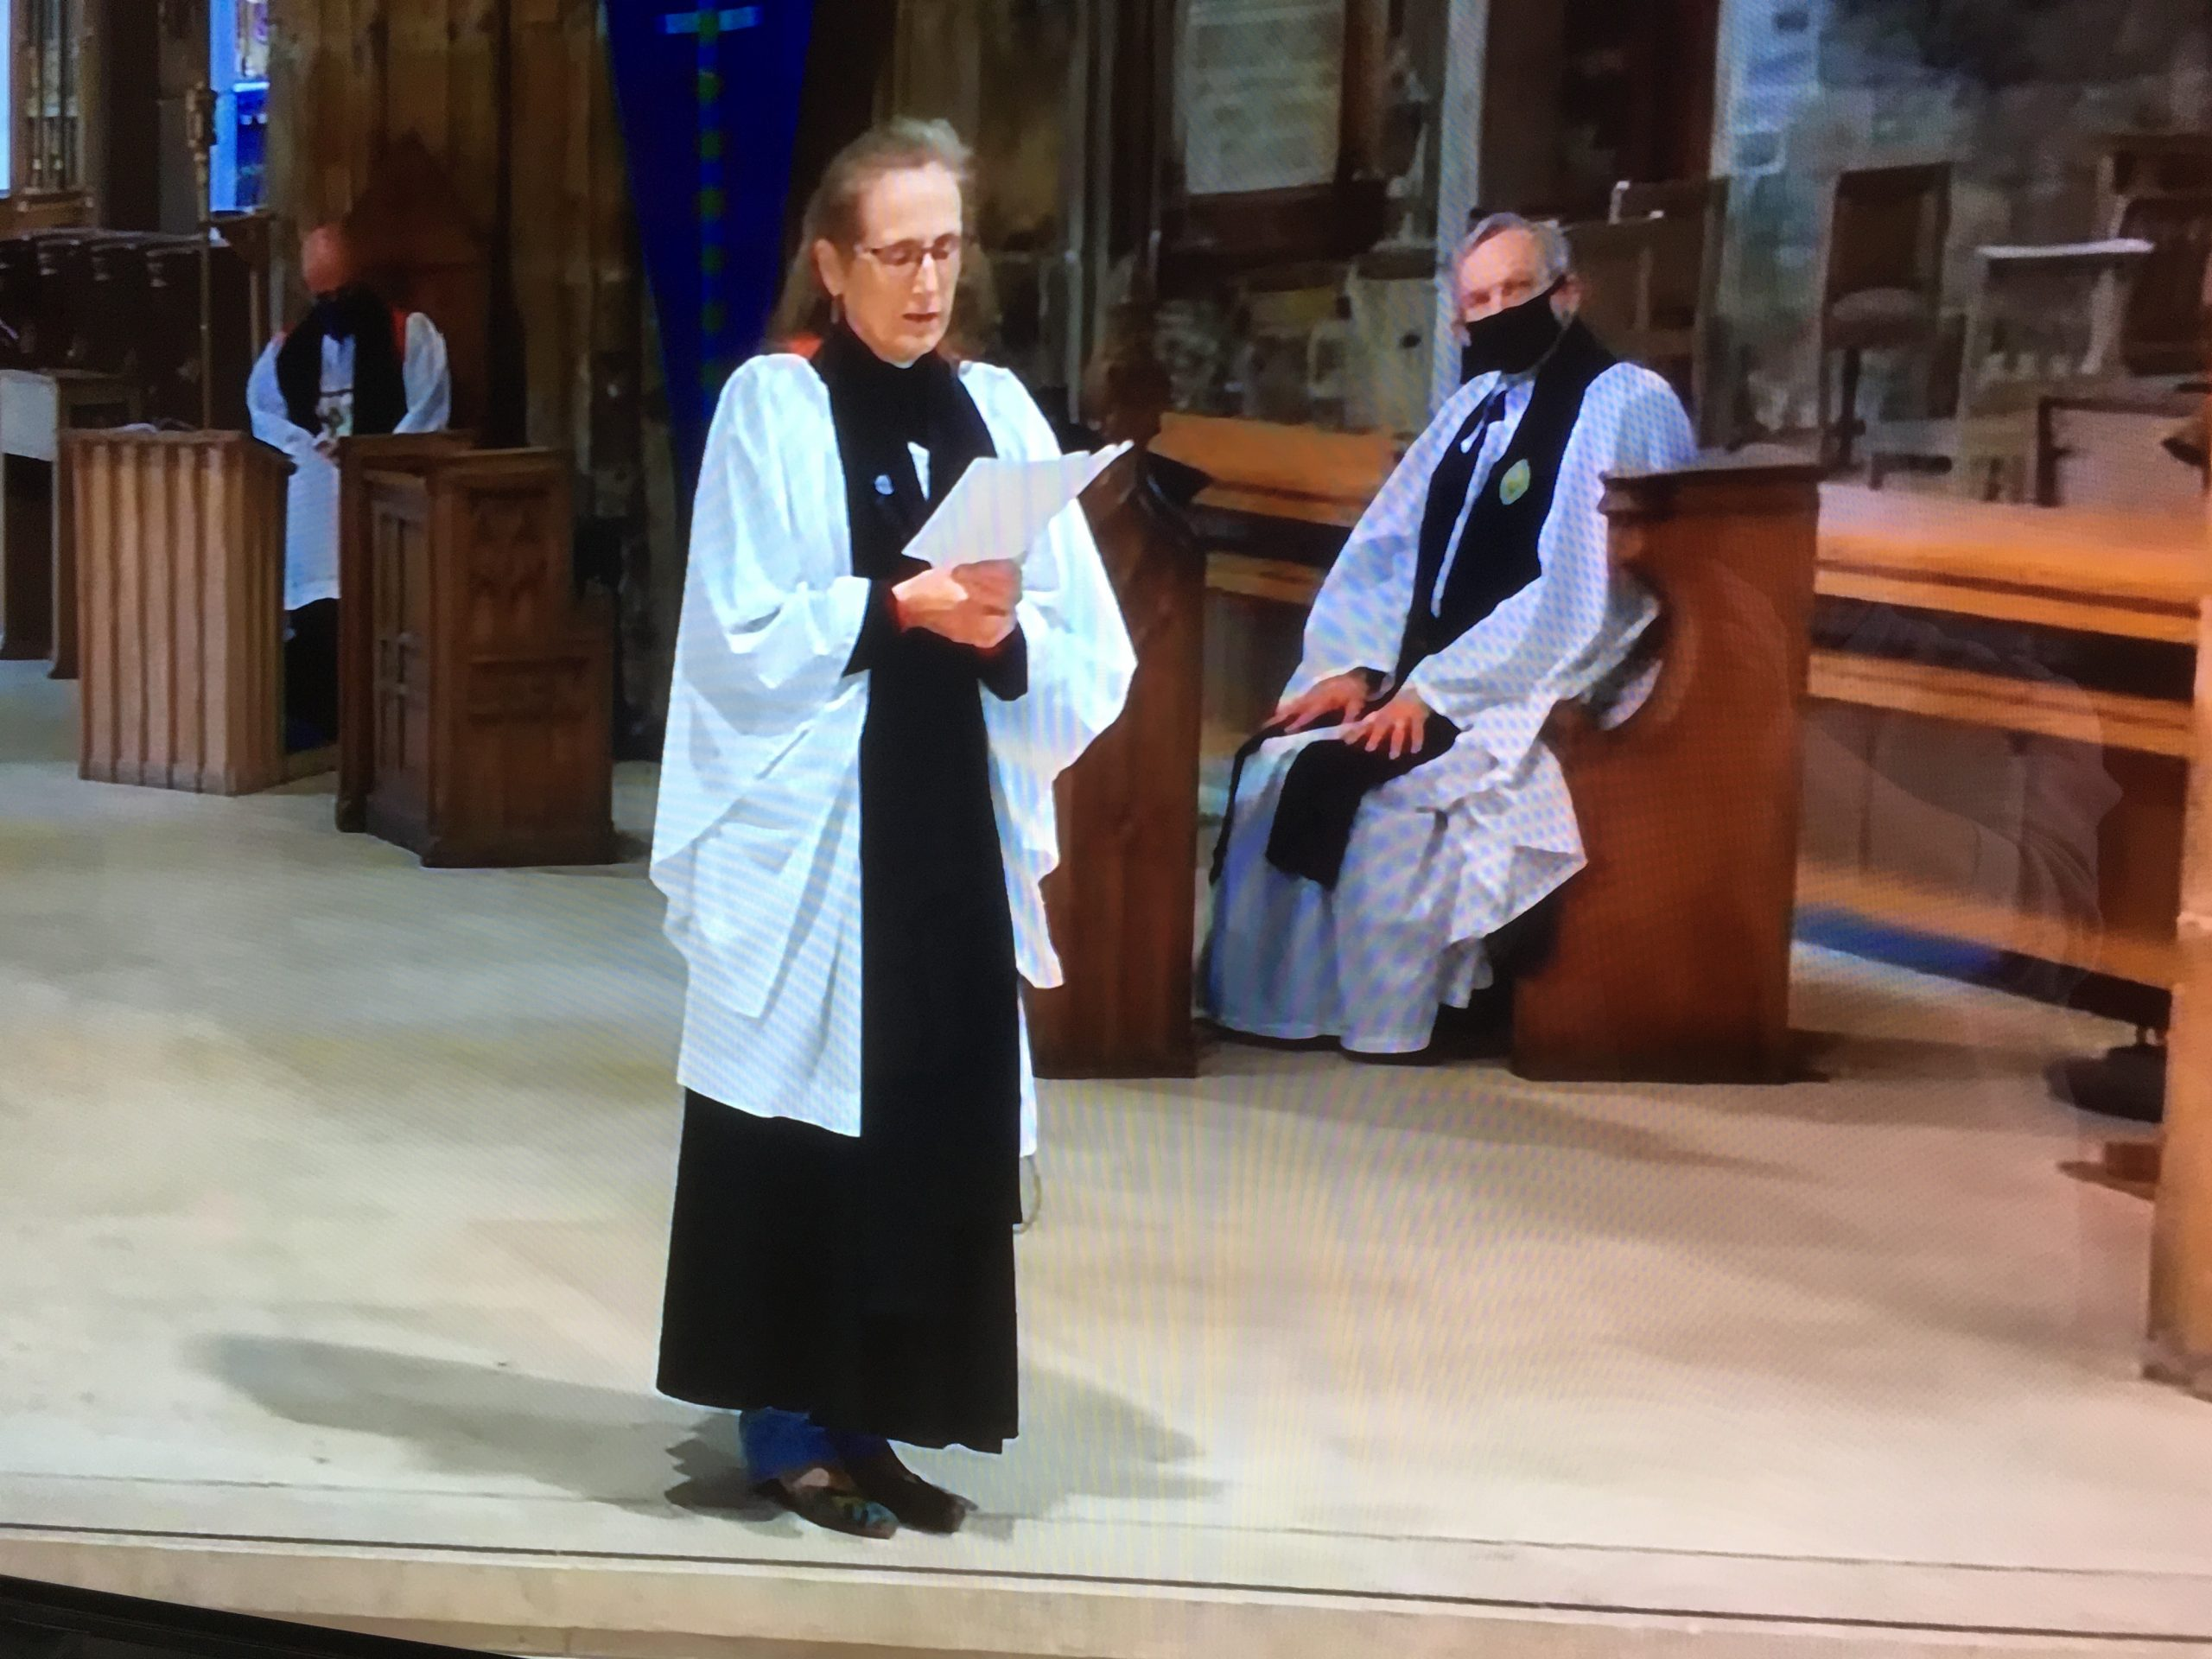 Rev Hilda Isaacson, Chaplain